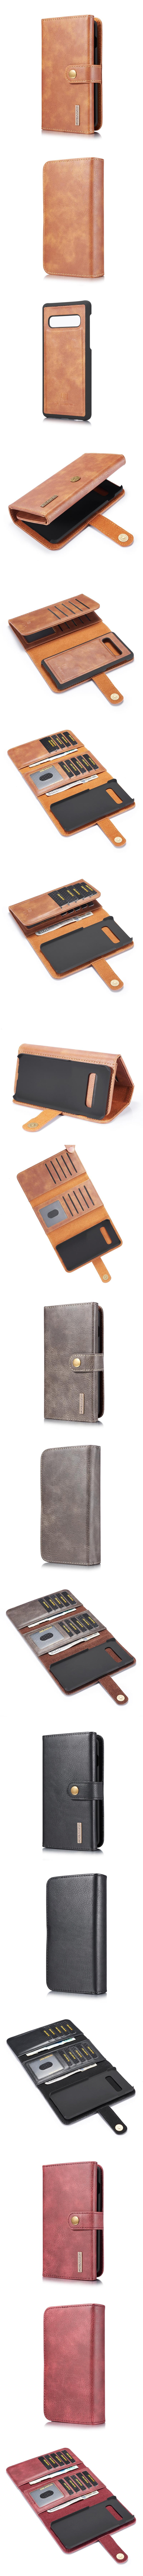 580-Samsung-分離二合一三折翻蓋十卡層卡片收納皮套手機套